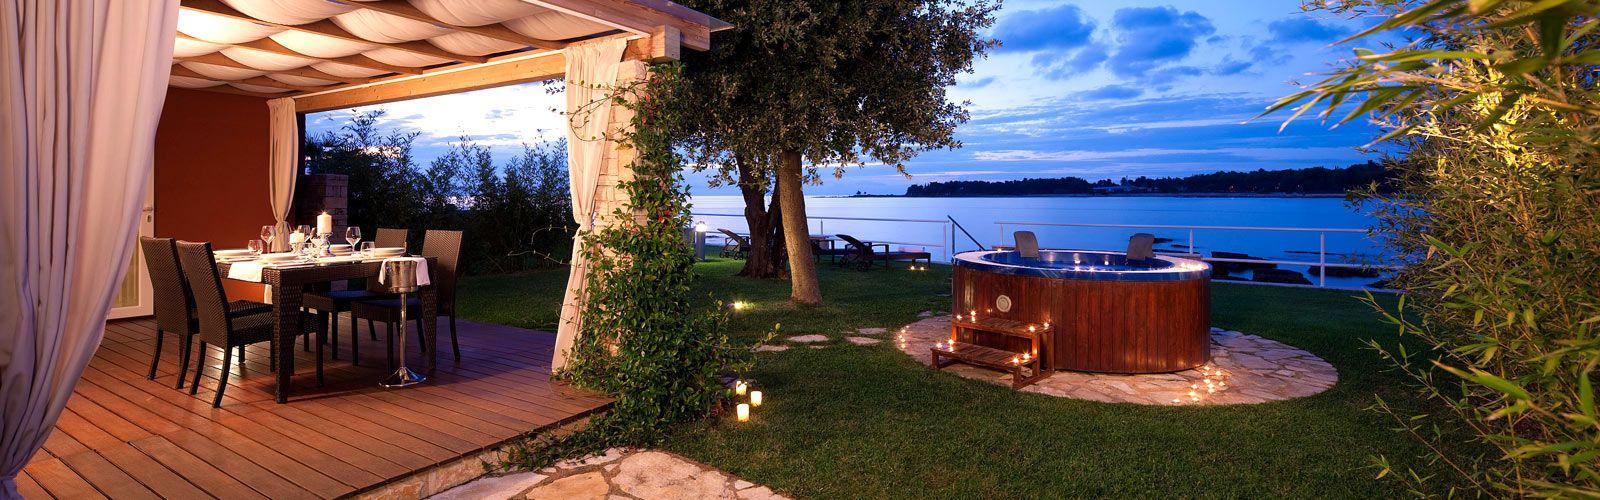 Perfect venue for bachelor/bachelorette party in Croatia